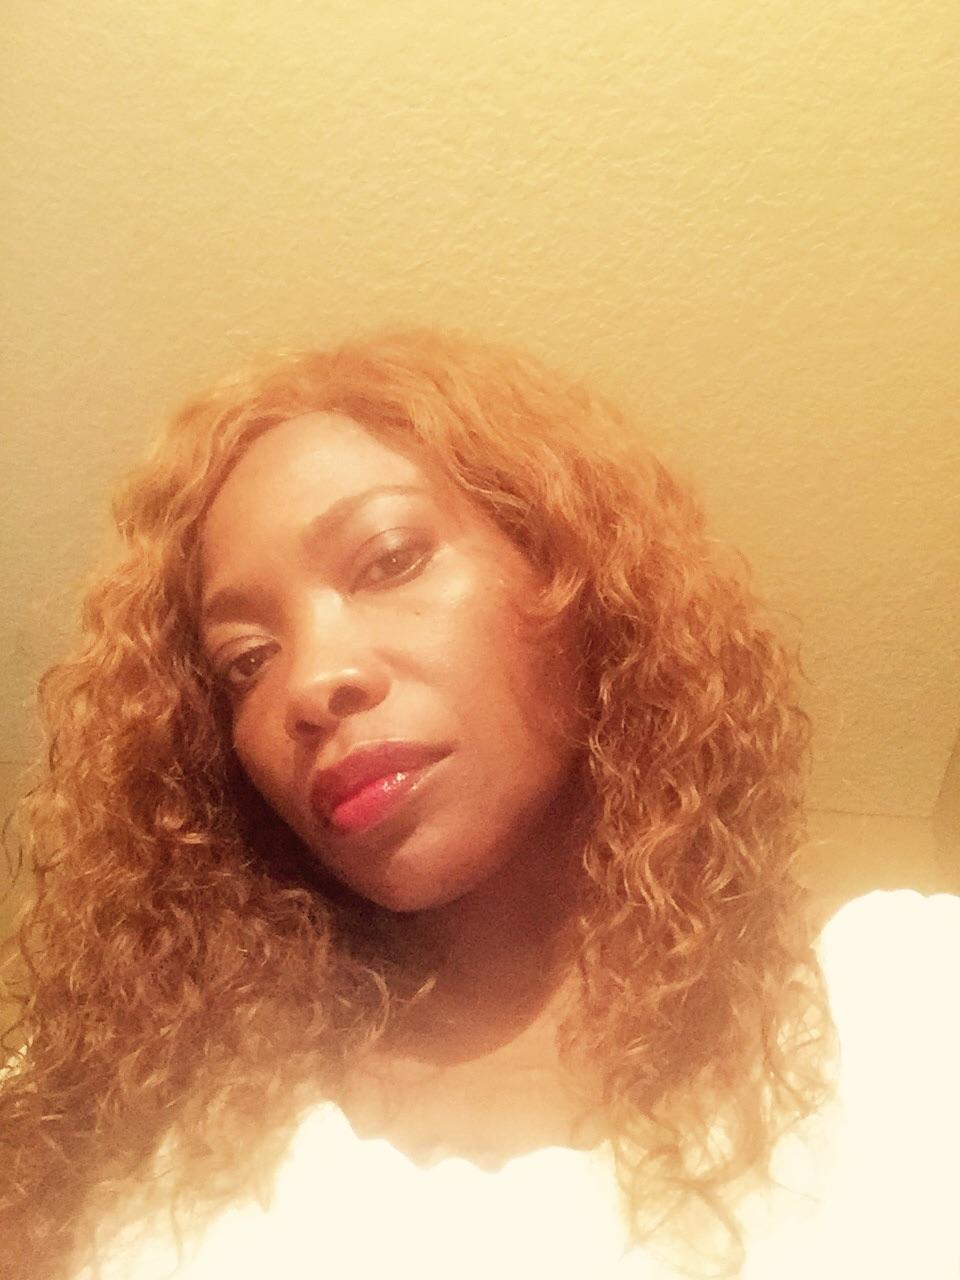 Miles and miles of reddish brown curls. Heavenly.